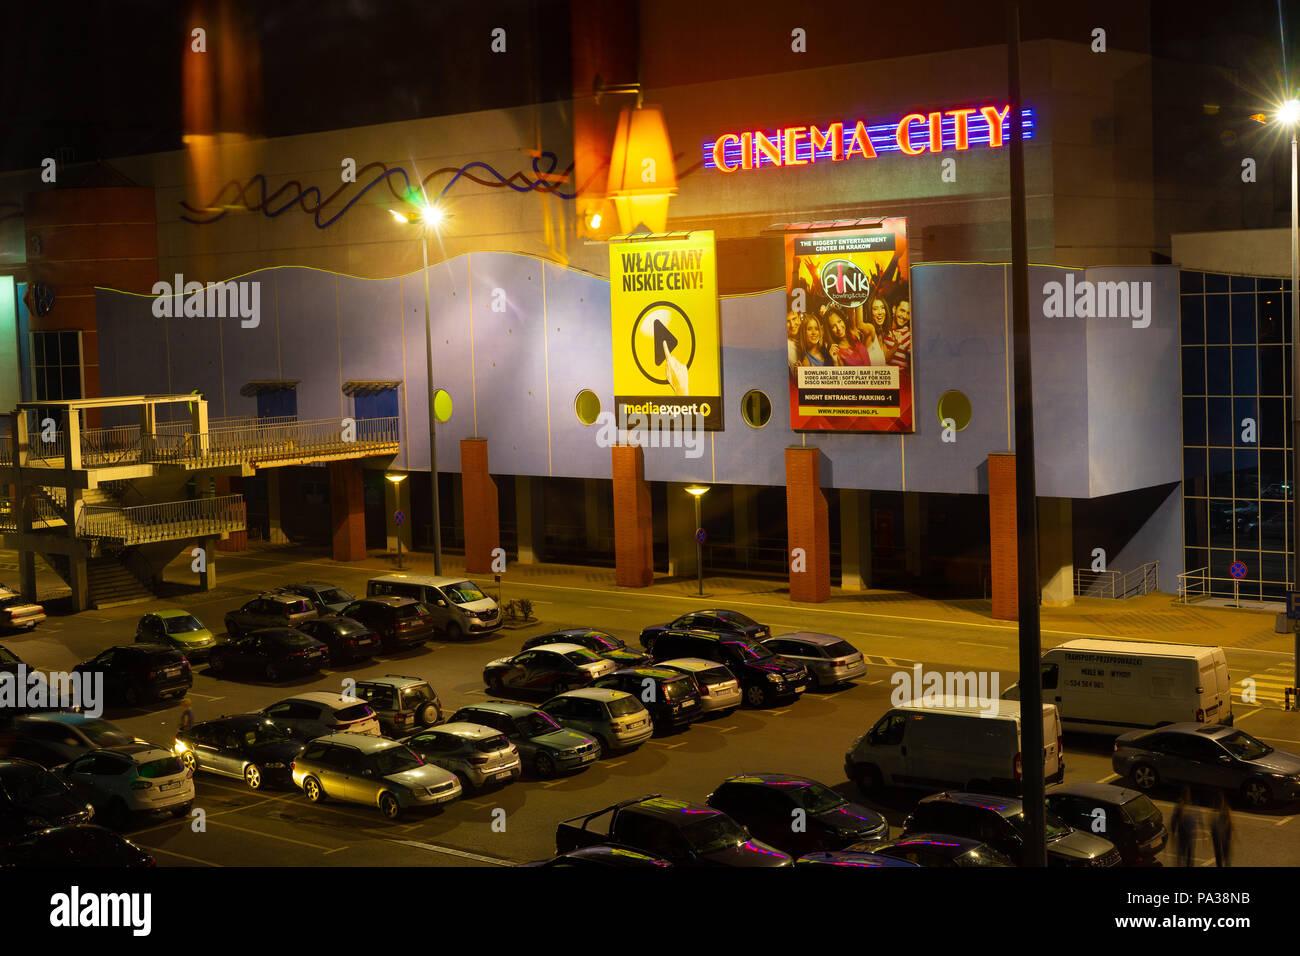 Cinema City at Gallery Plaza Krakow, Poland, Europe. - Stock Image